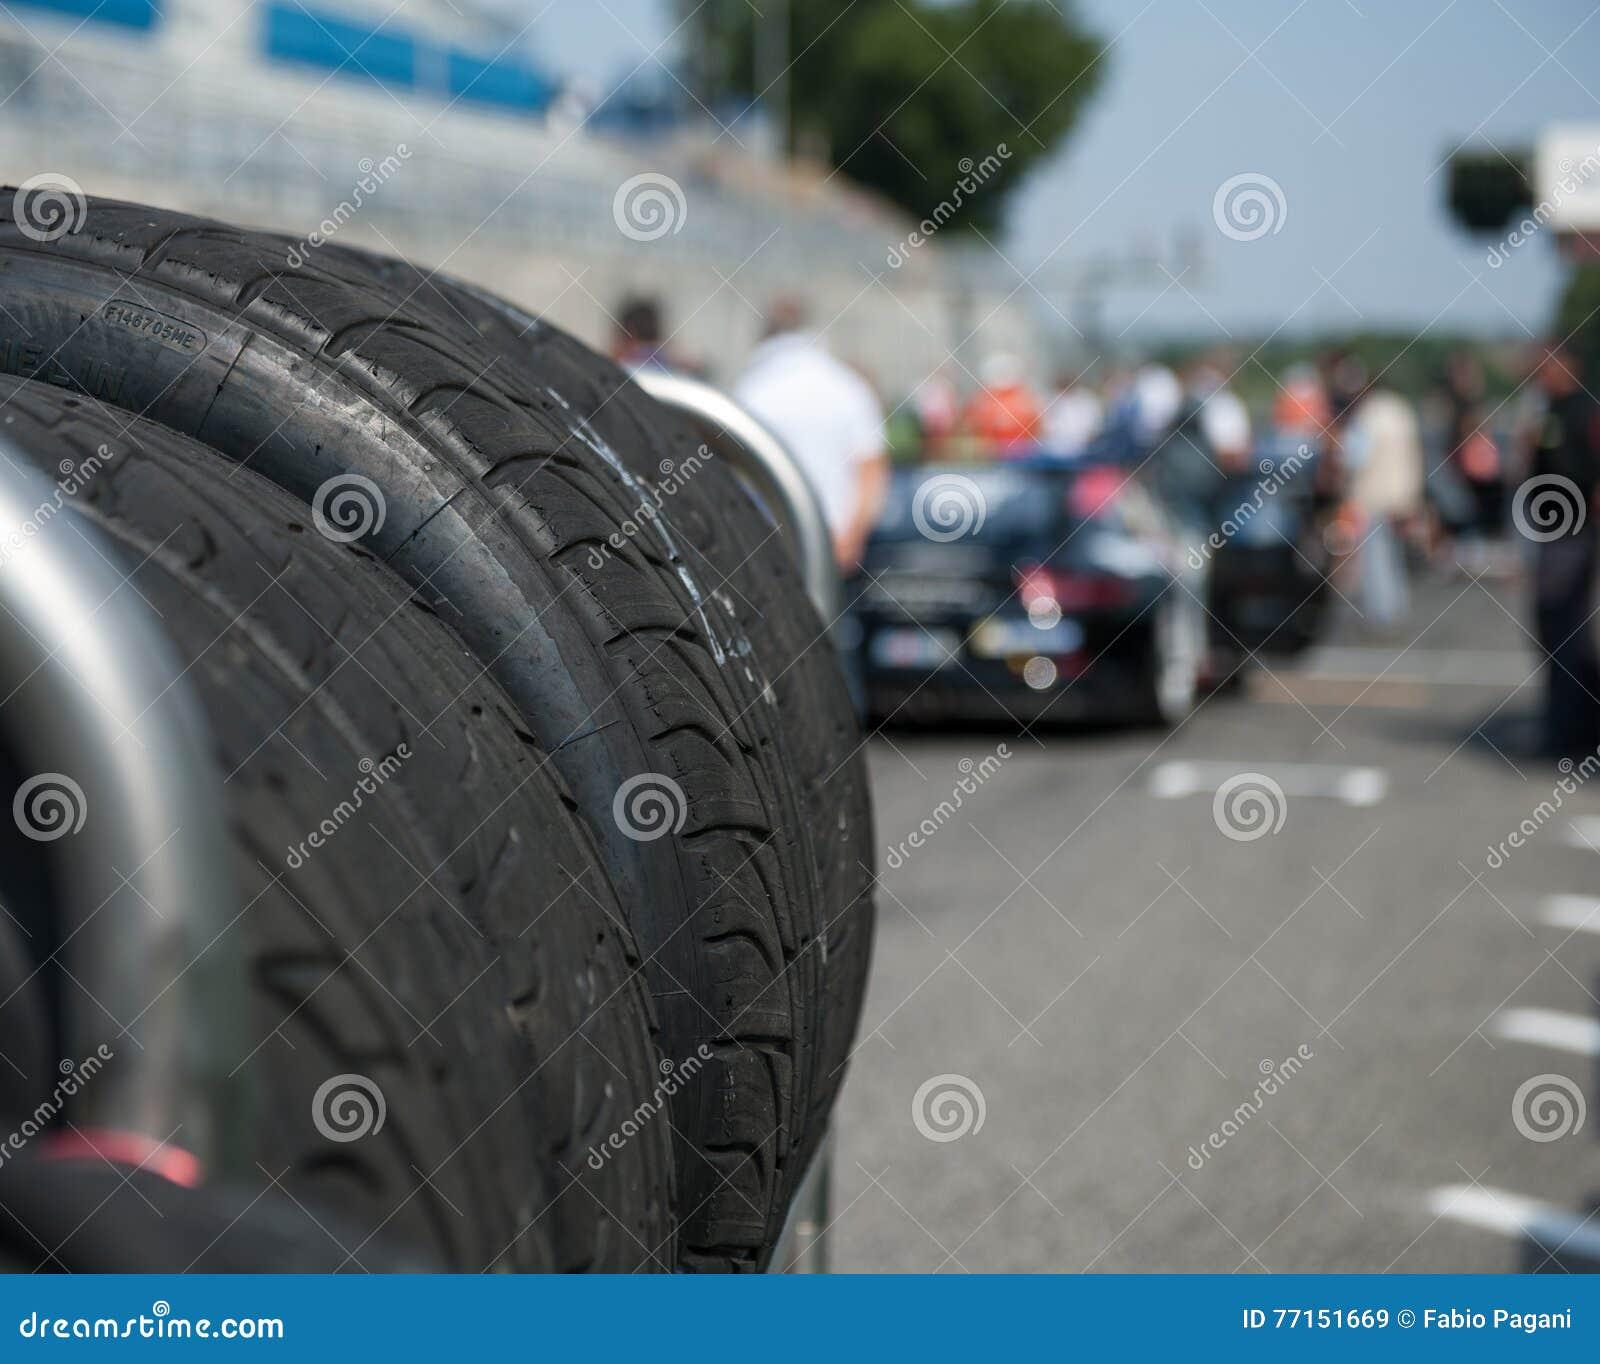 Sport automobile réglé de emballage humide de pneu